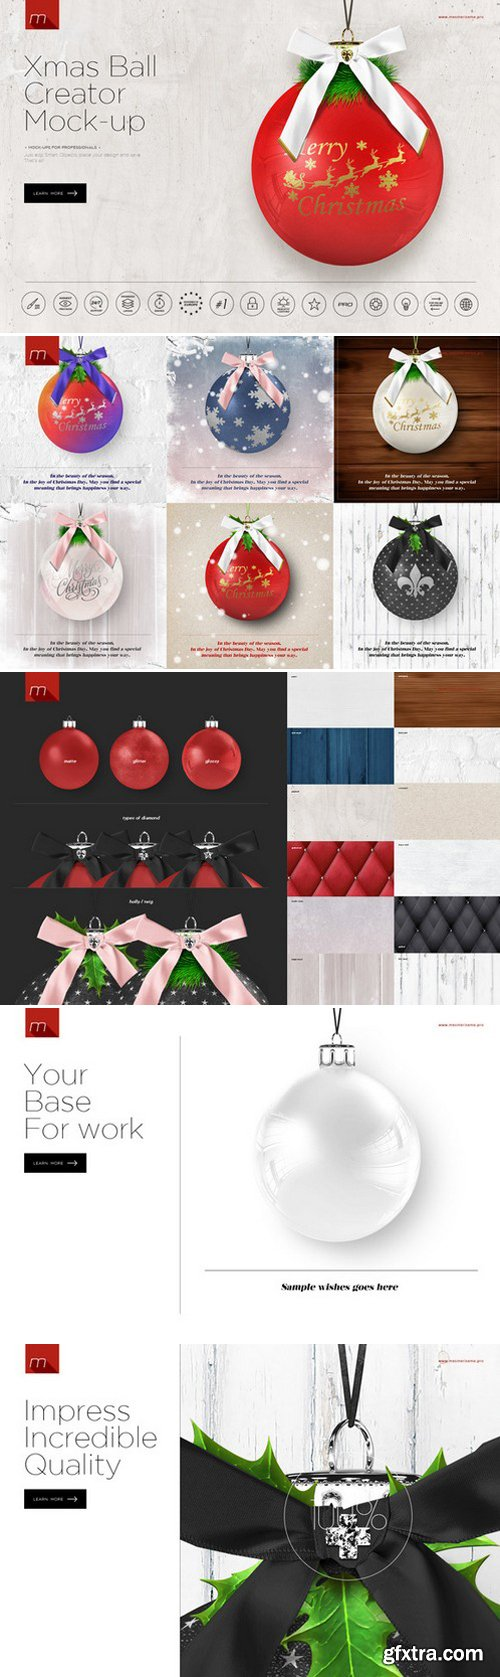 CM - Christmas Ball Card Creator Mock-up 419885